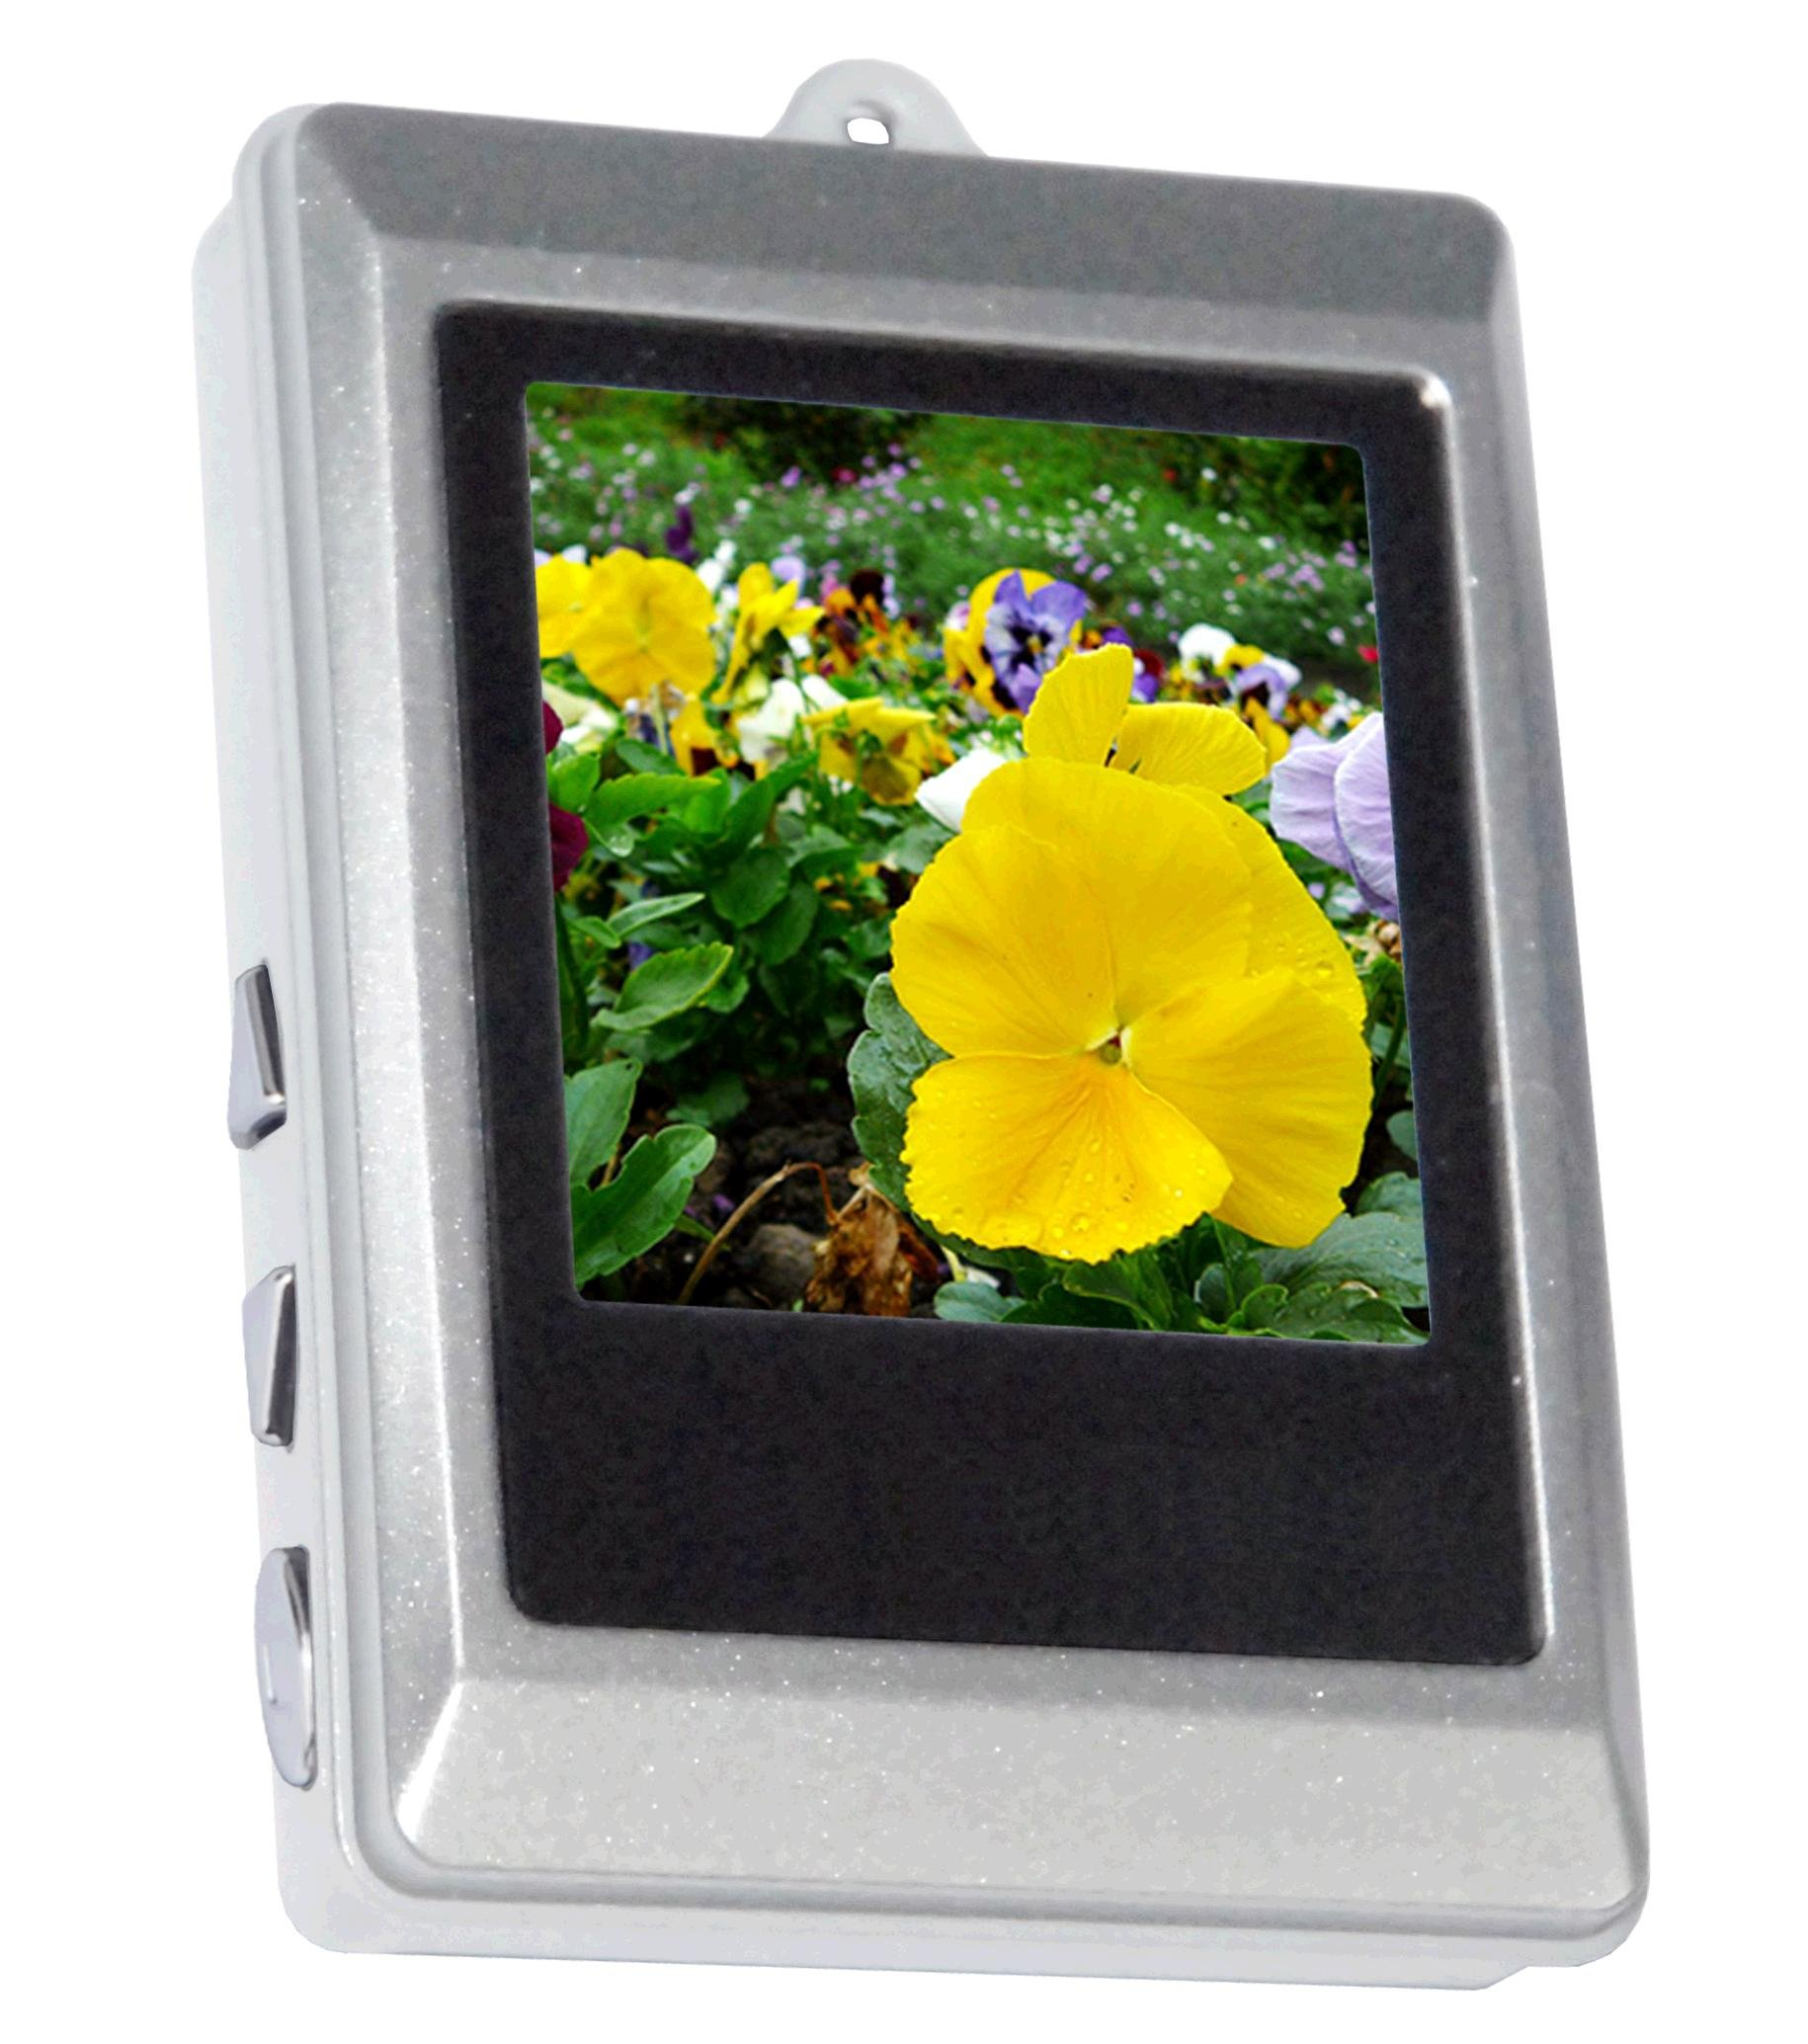 Curtis DPF151 1.5-Inch Digital Photo Frame Key Chain (Silver)